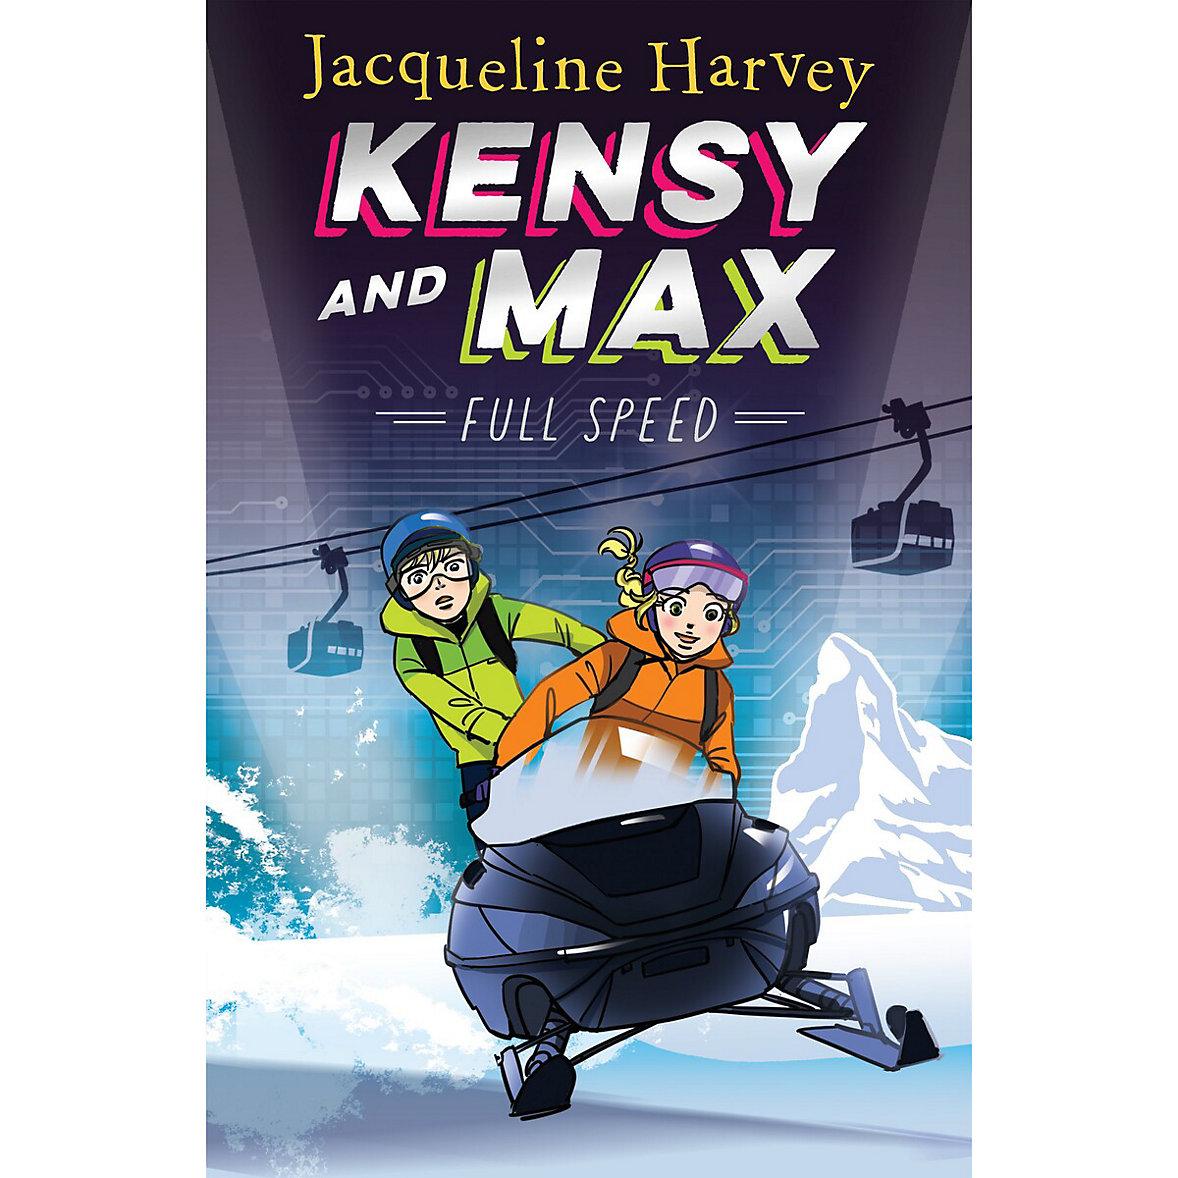 Kensy and Max - Jacqueline Harvey